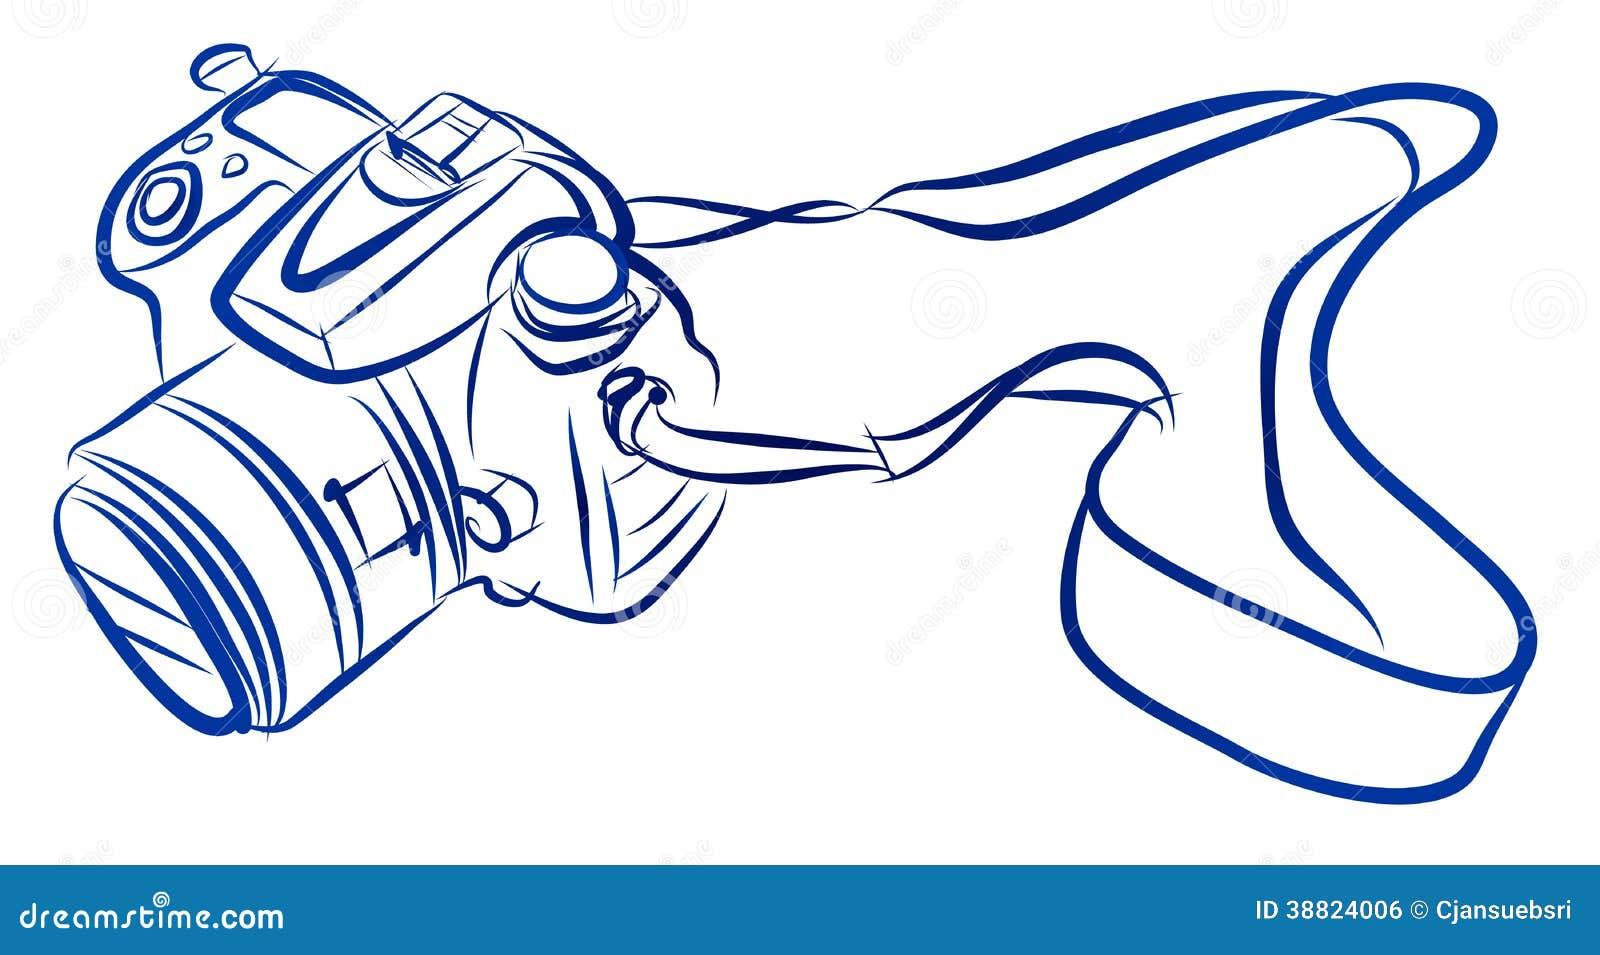 Camera Logo Vector Free Download | CNdaily |